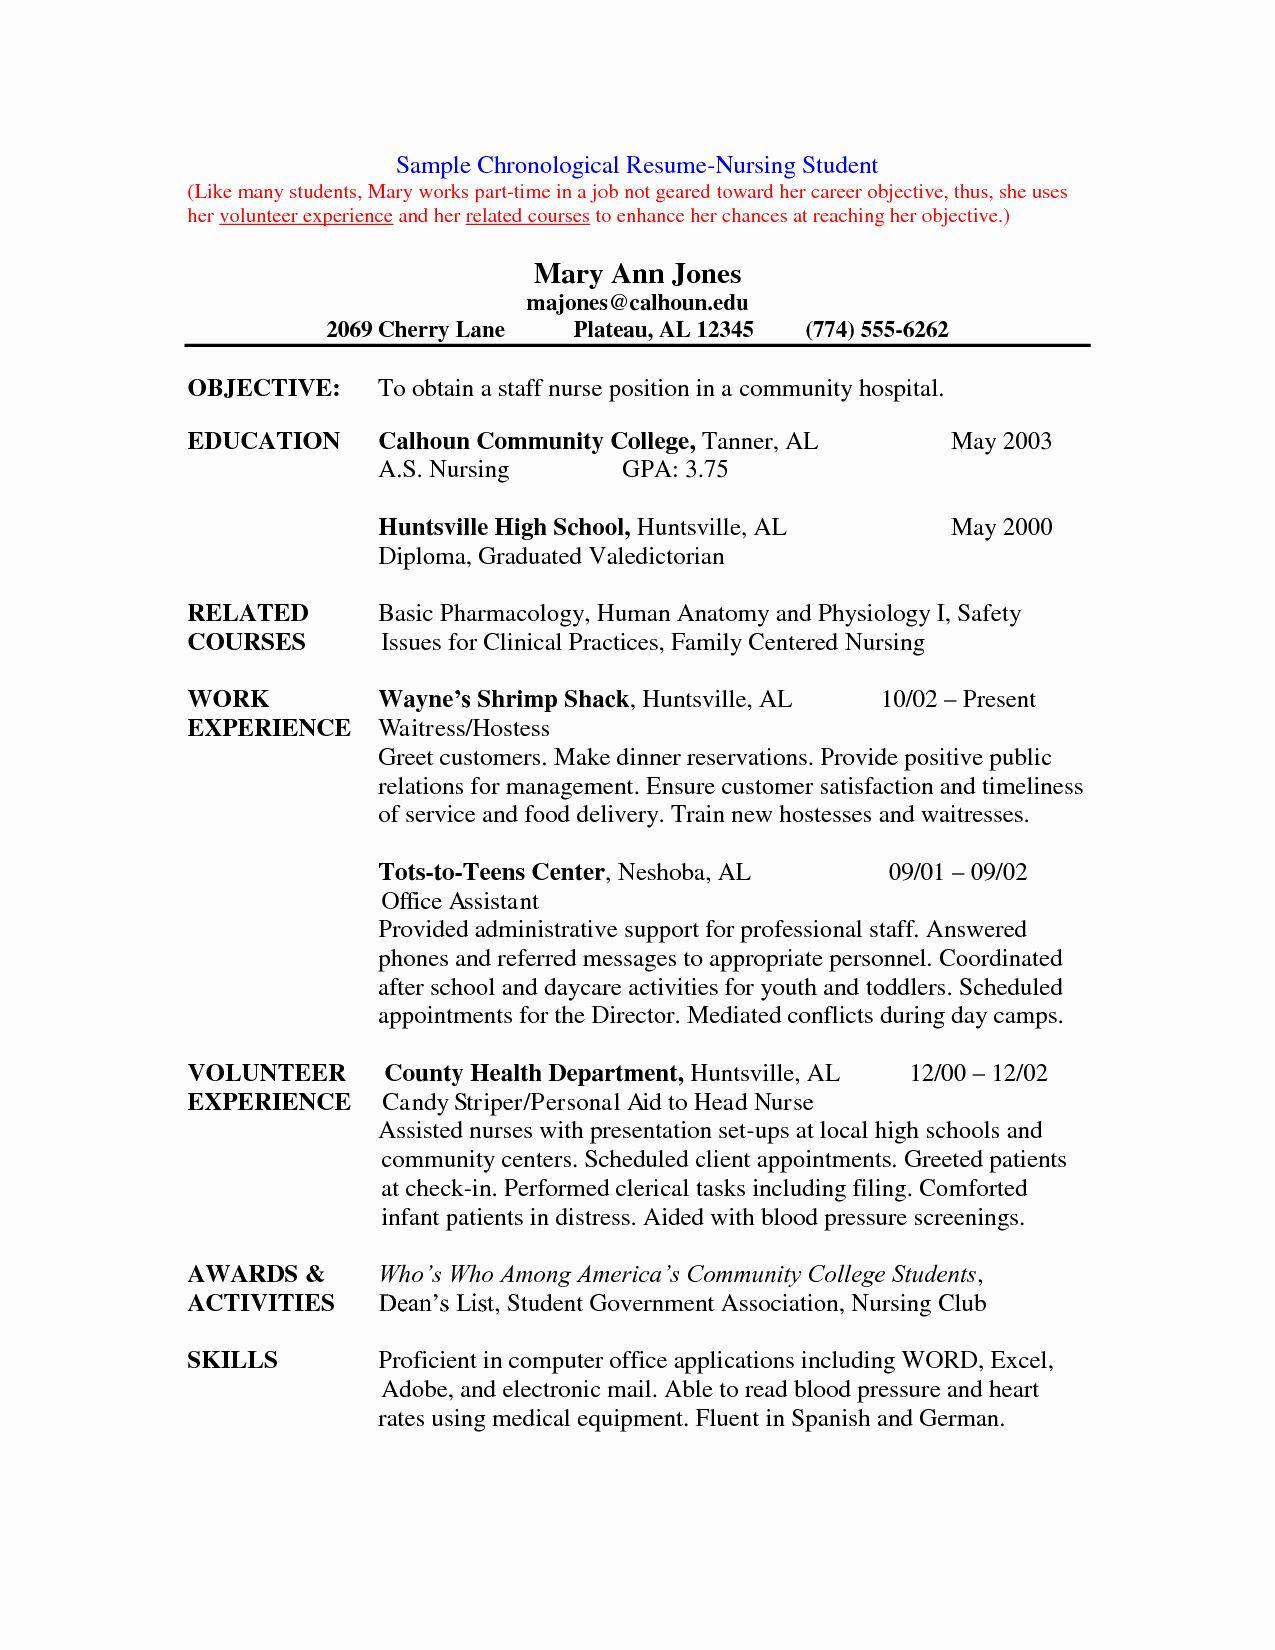 Nursing Student Resume Templates Fresh Cover Letters For Nursing Job Application Pdf Nursi Nursing Resume Template Student Nurse Resume Student Resume Template